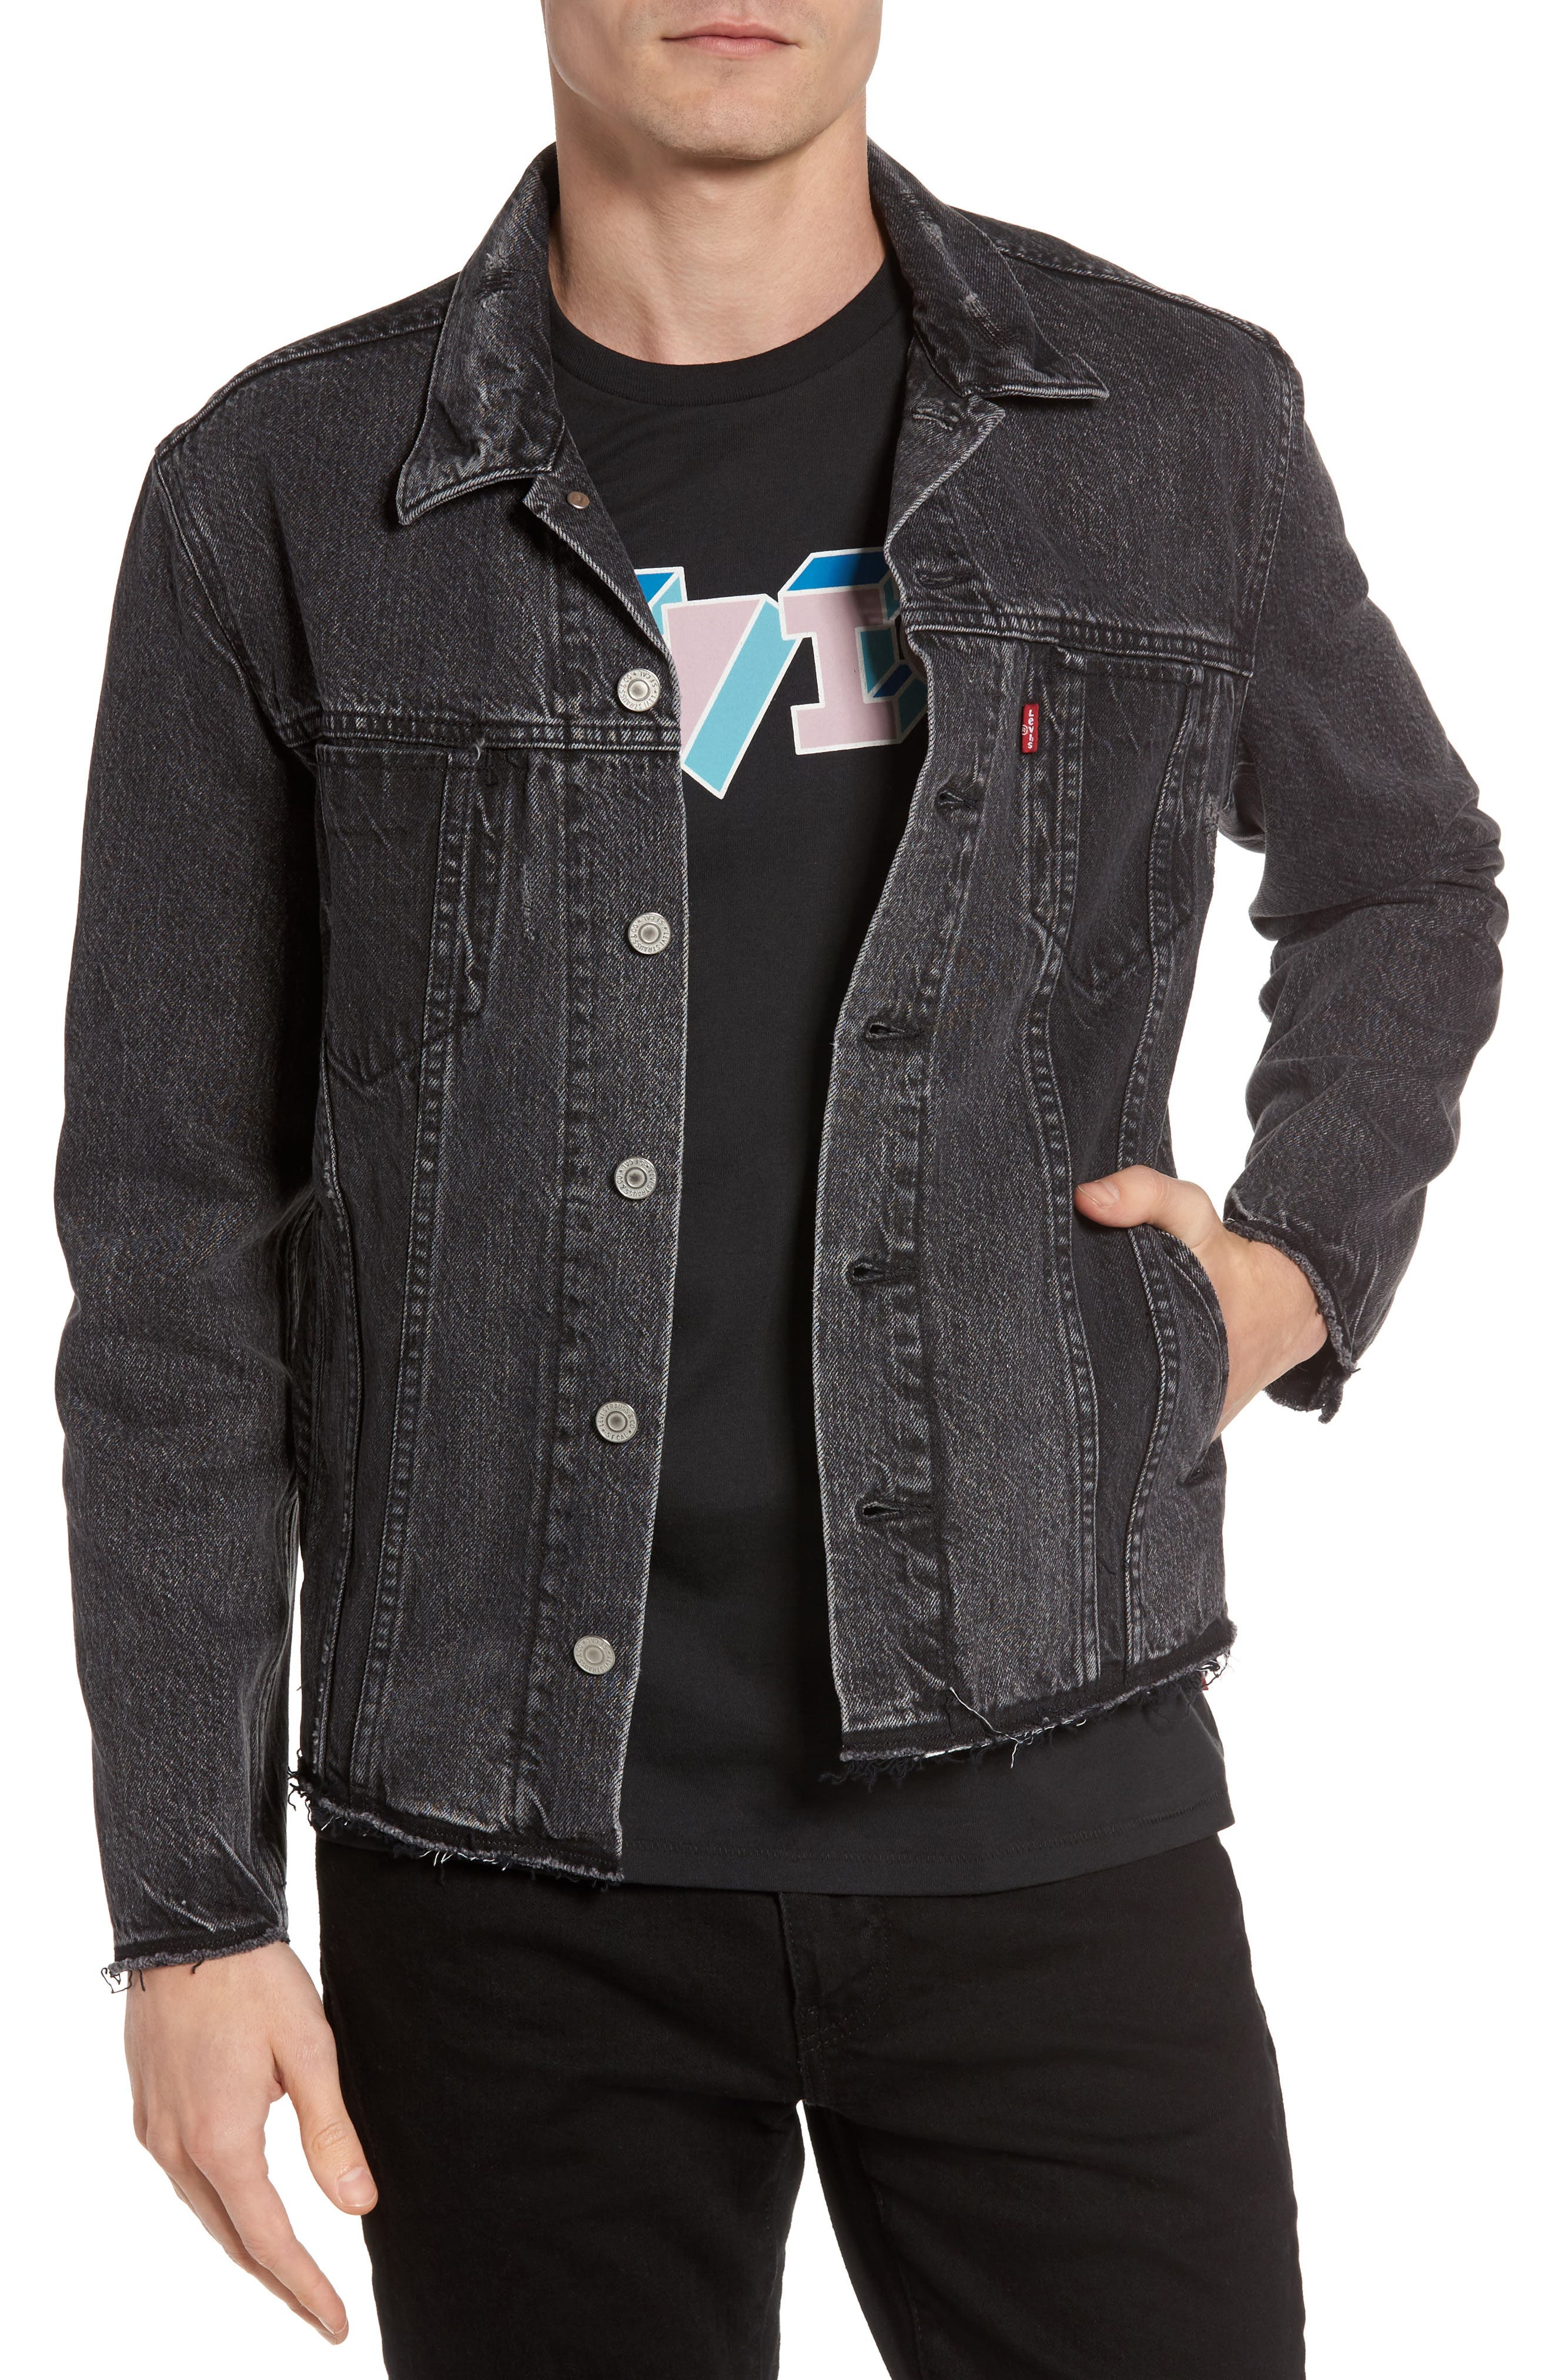 Alternate Image 1 Selected - Levi's® Altered Distressed Denim Trucker Jacket